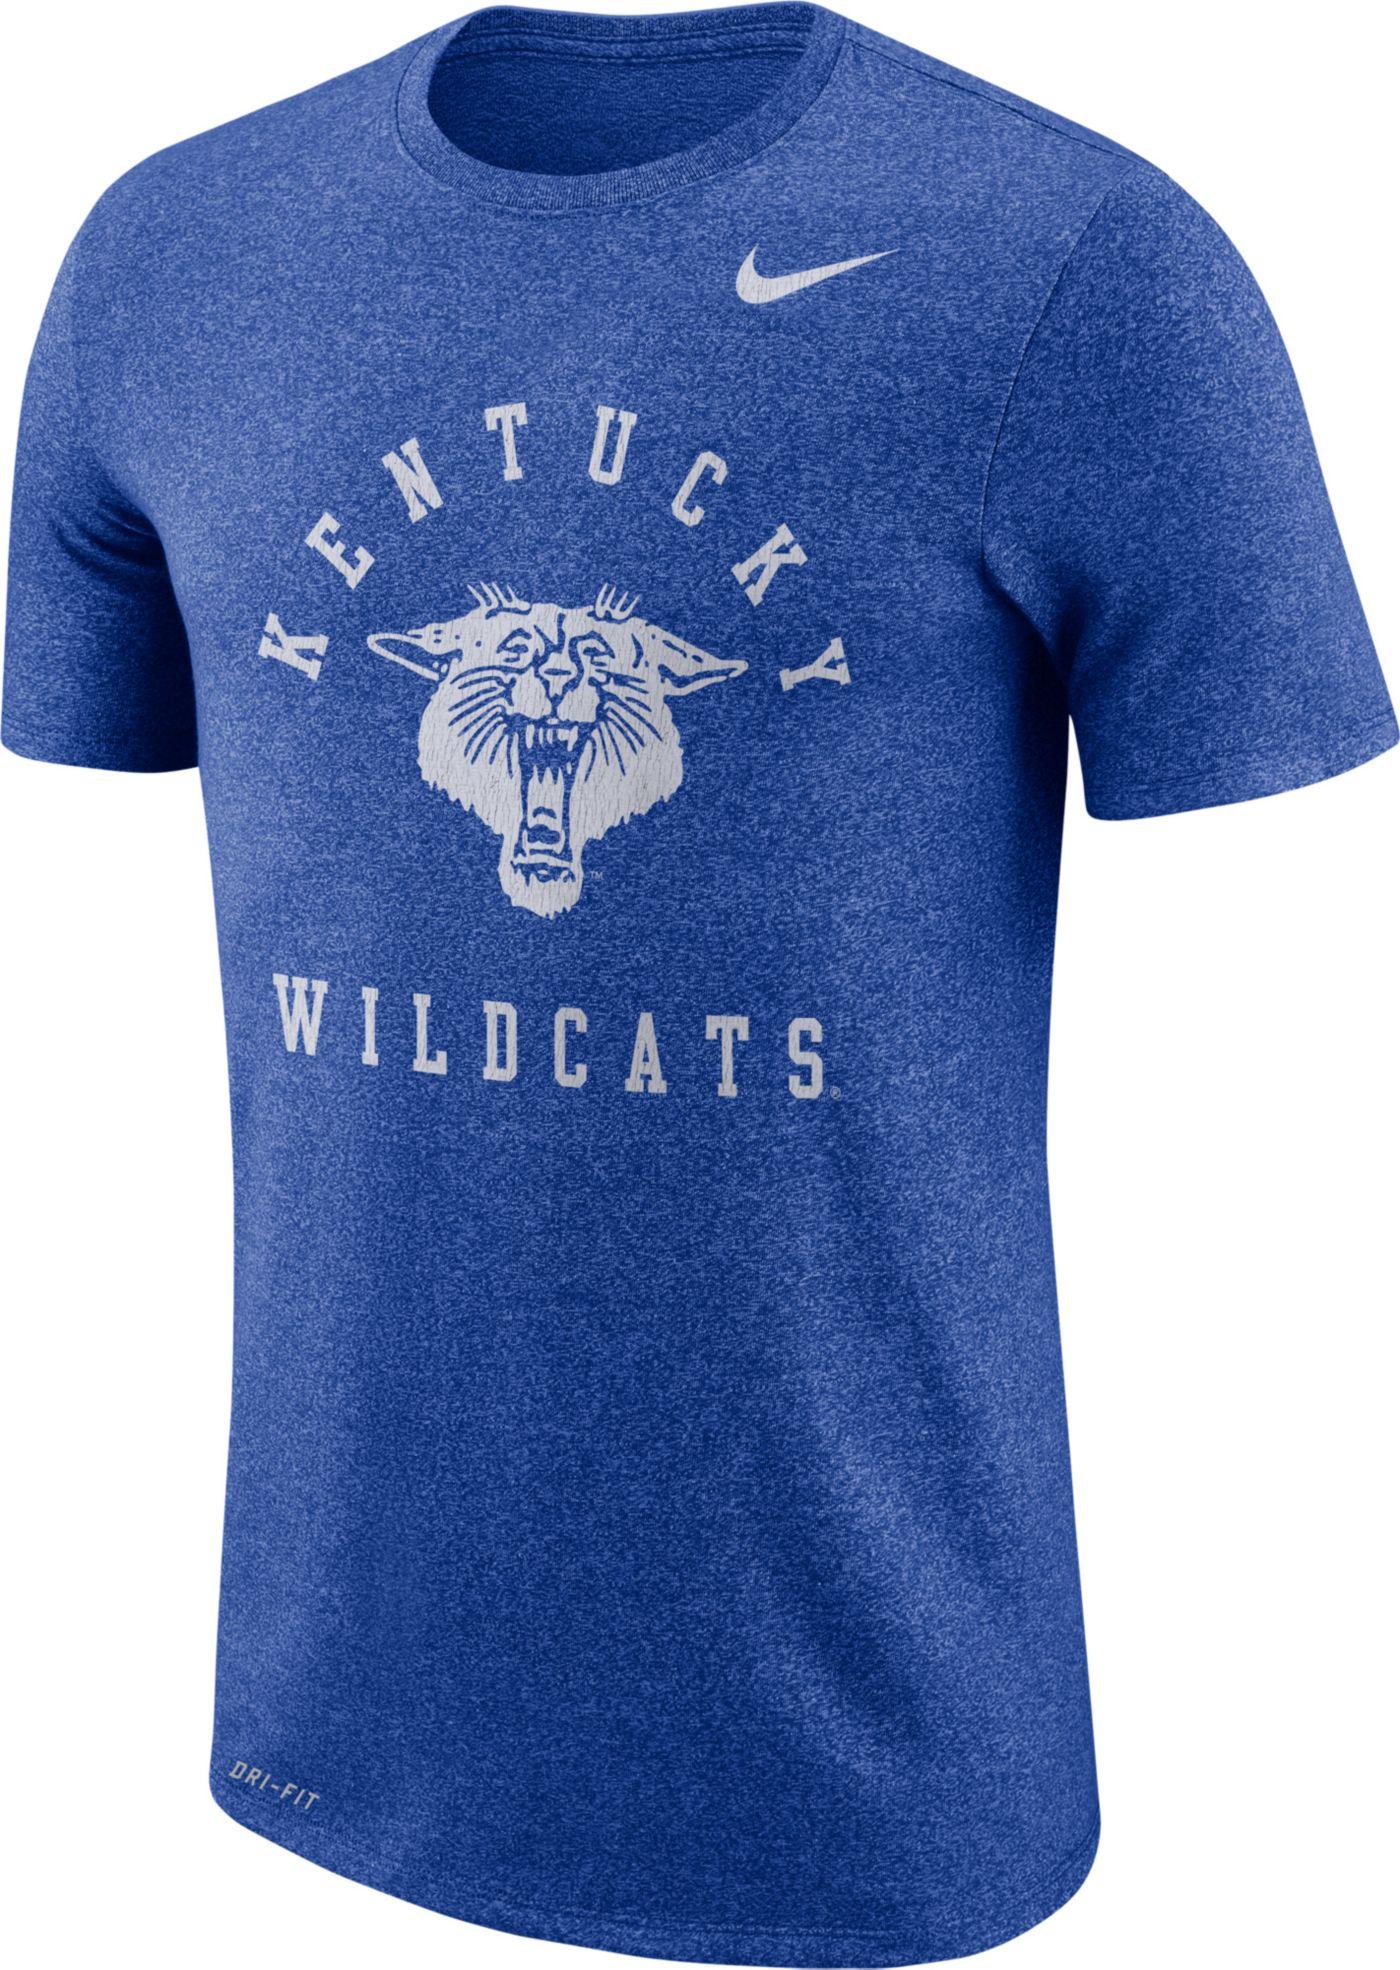 Nike Men's Kentucky Wildcats Blue Marled Raglan T-Shirt